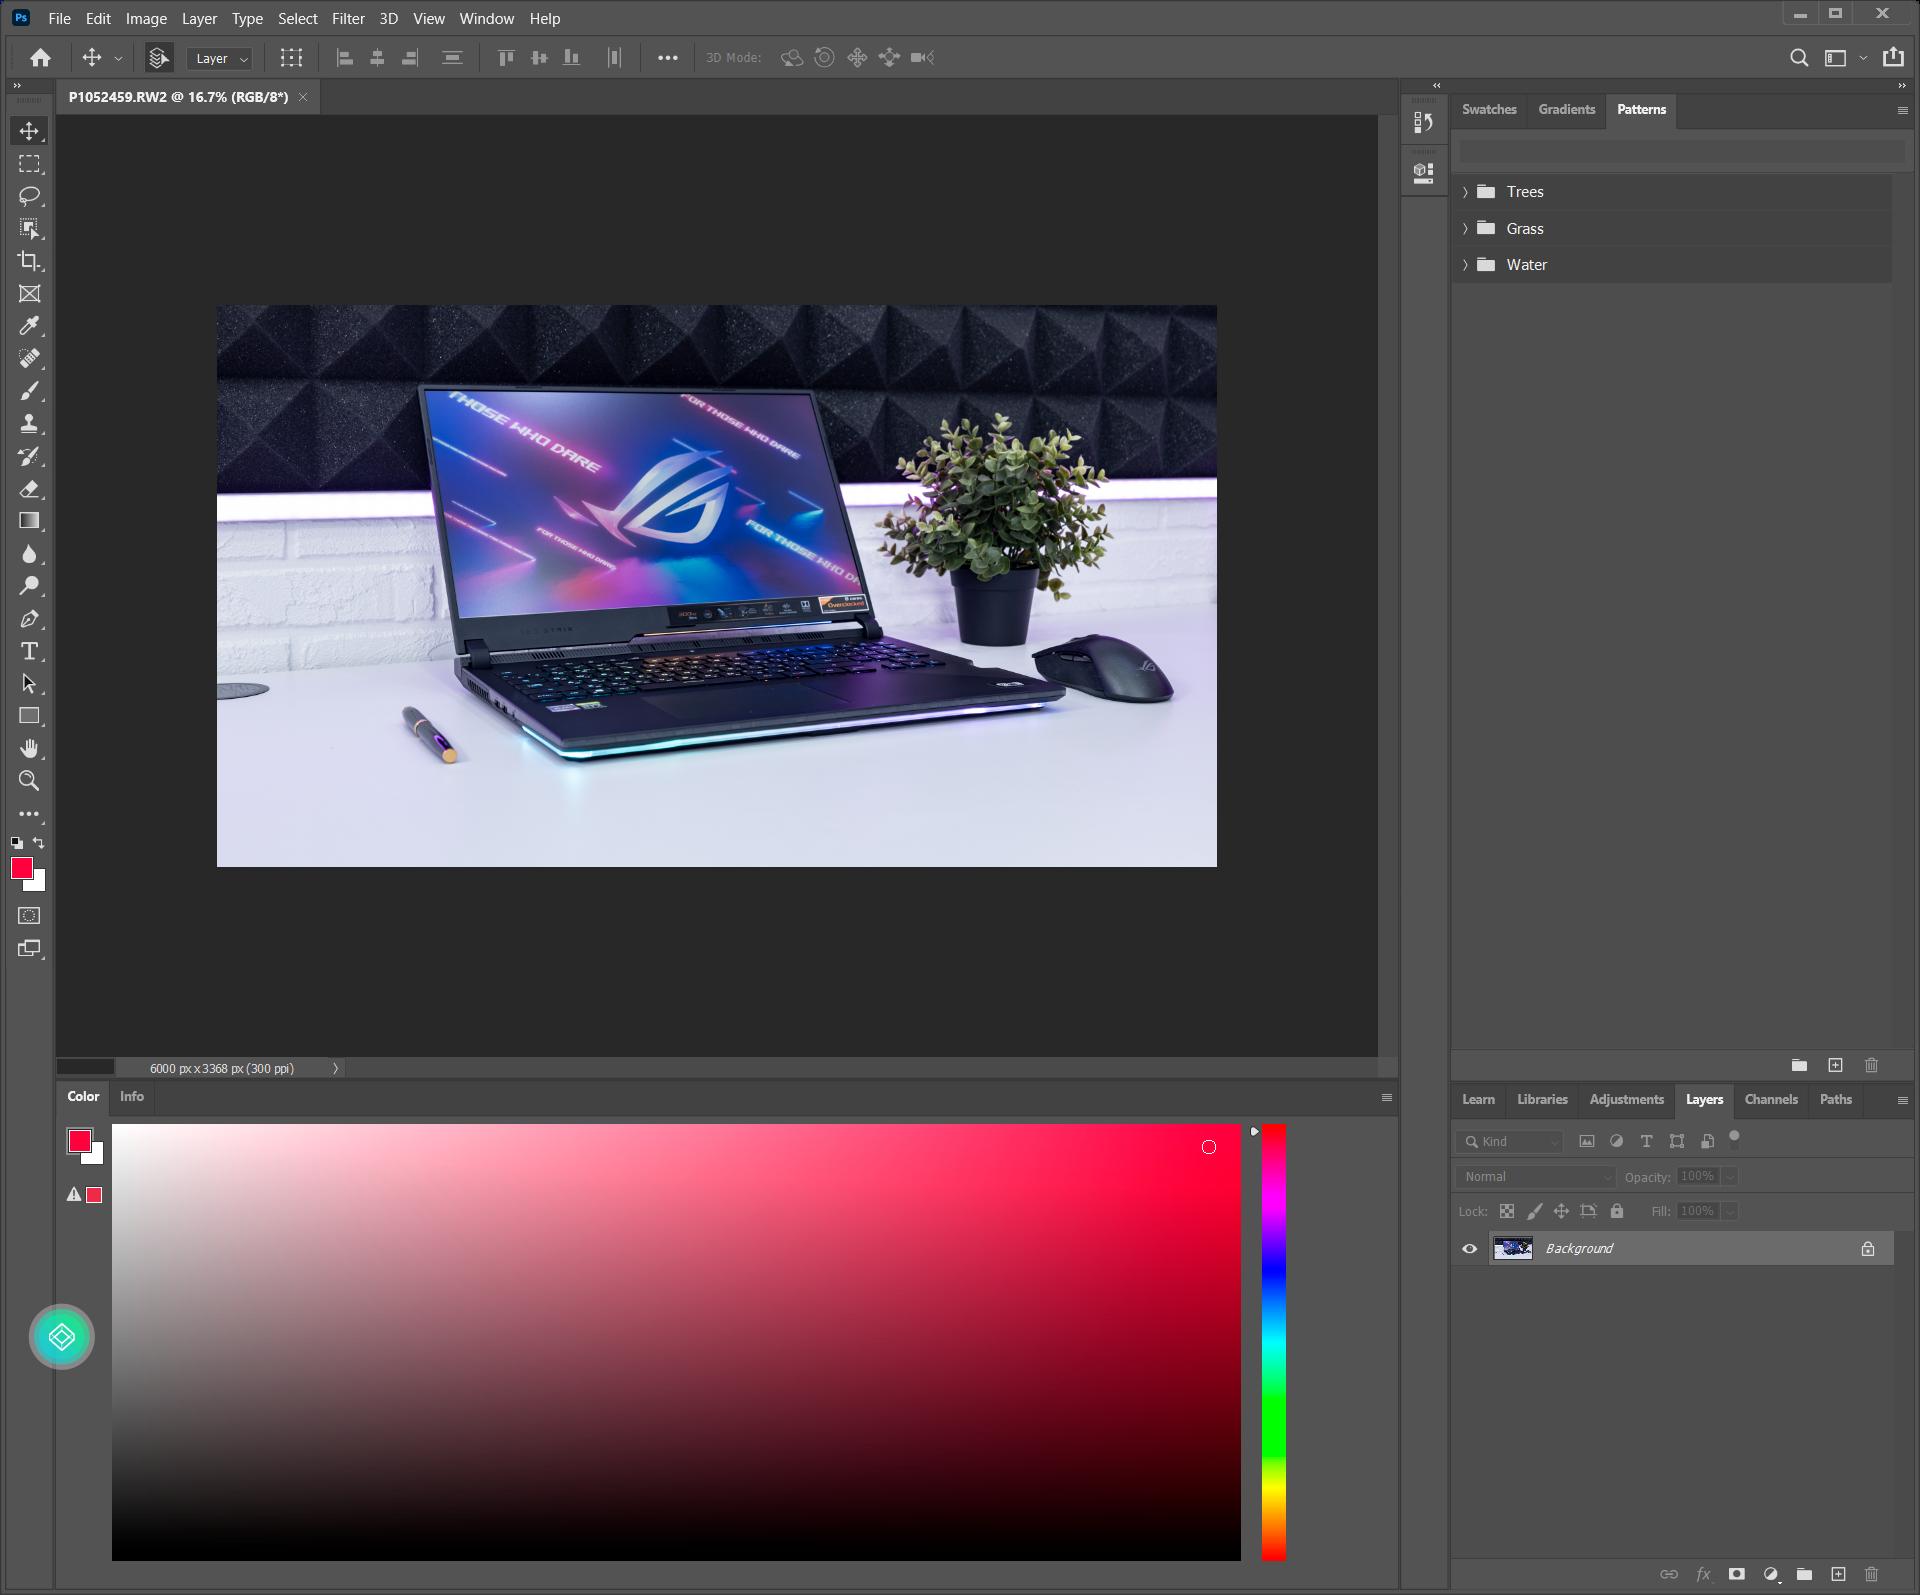 Adobe Photoshop на двух экранах